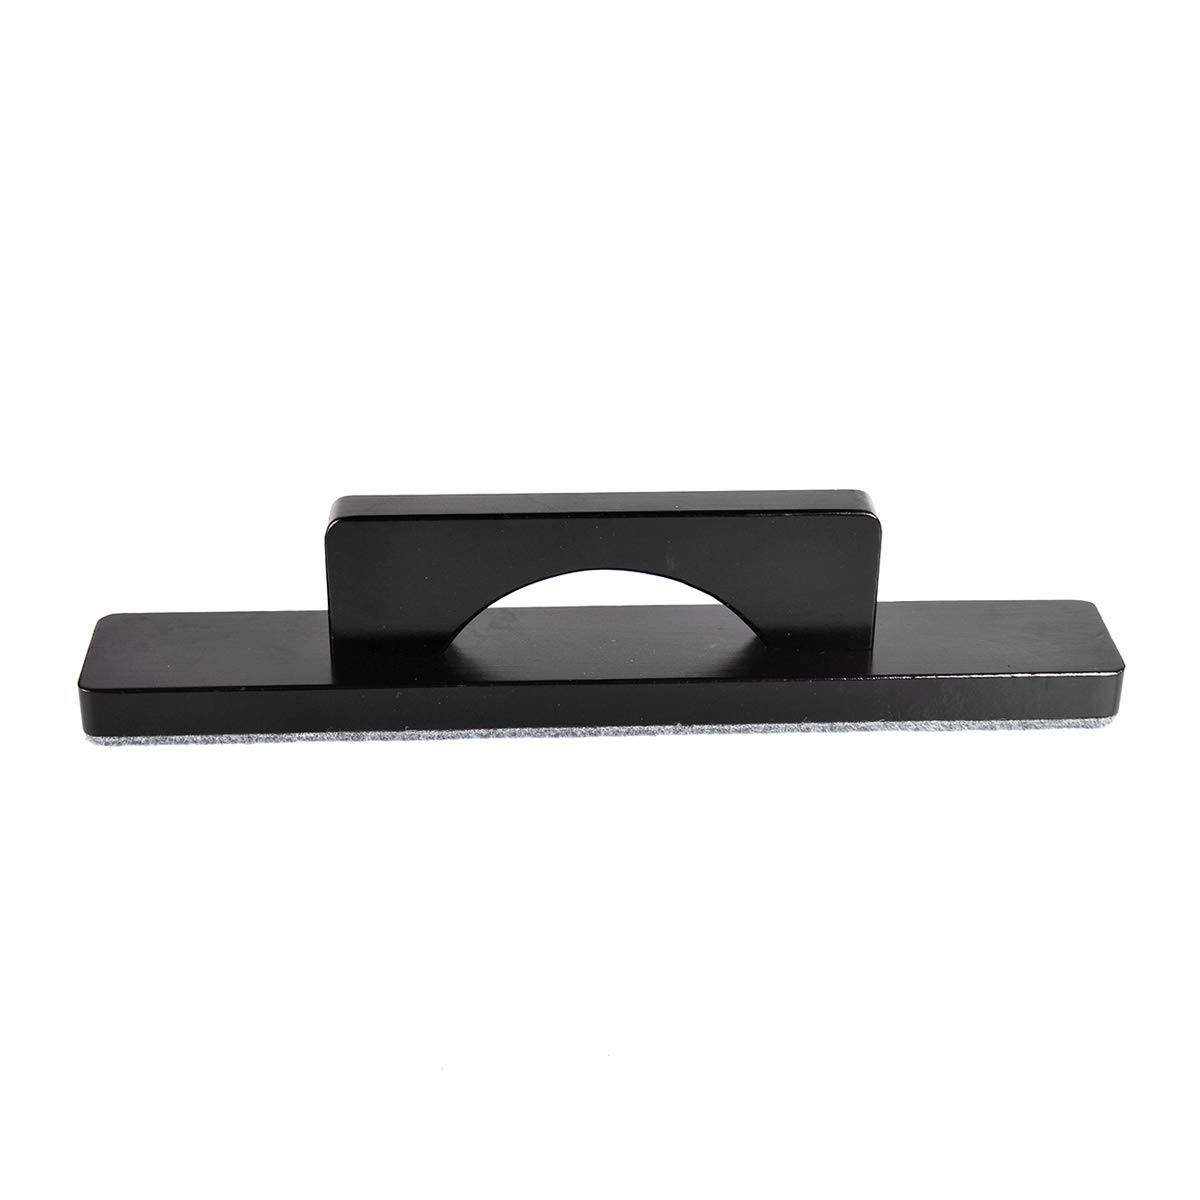 IdealEnjoy Shuffleboard Brush, Black by IdealEnjoy